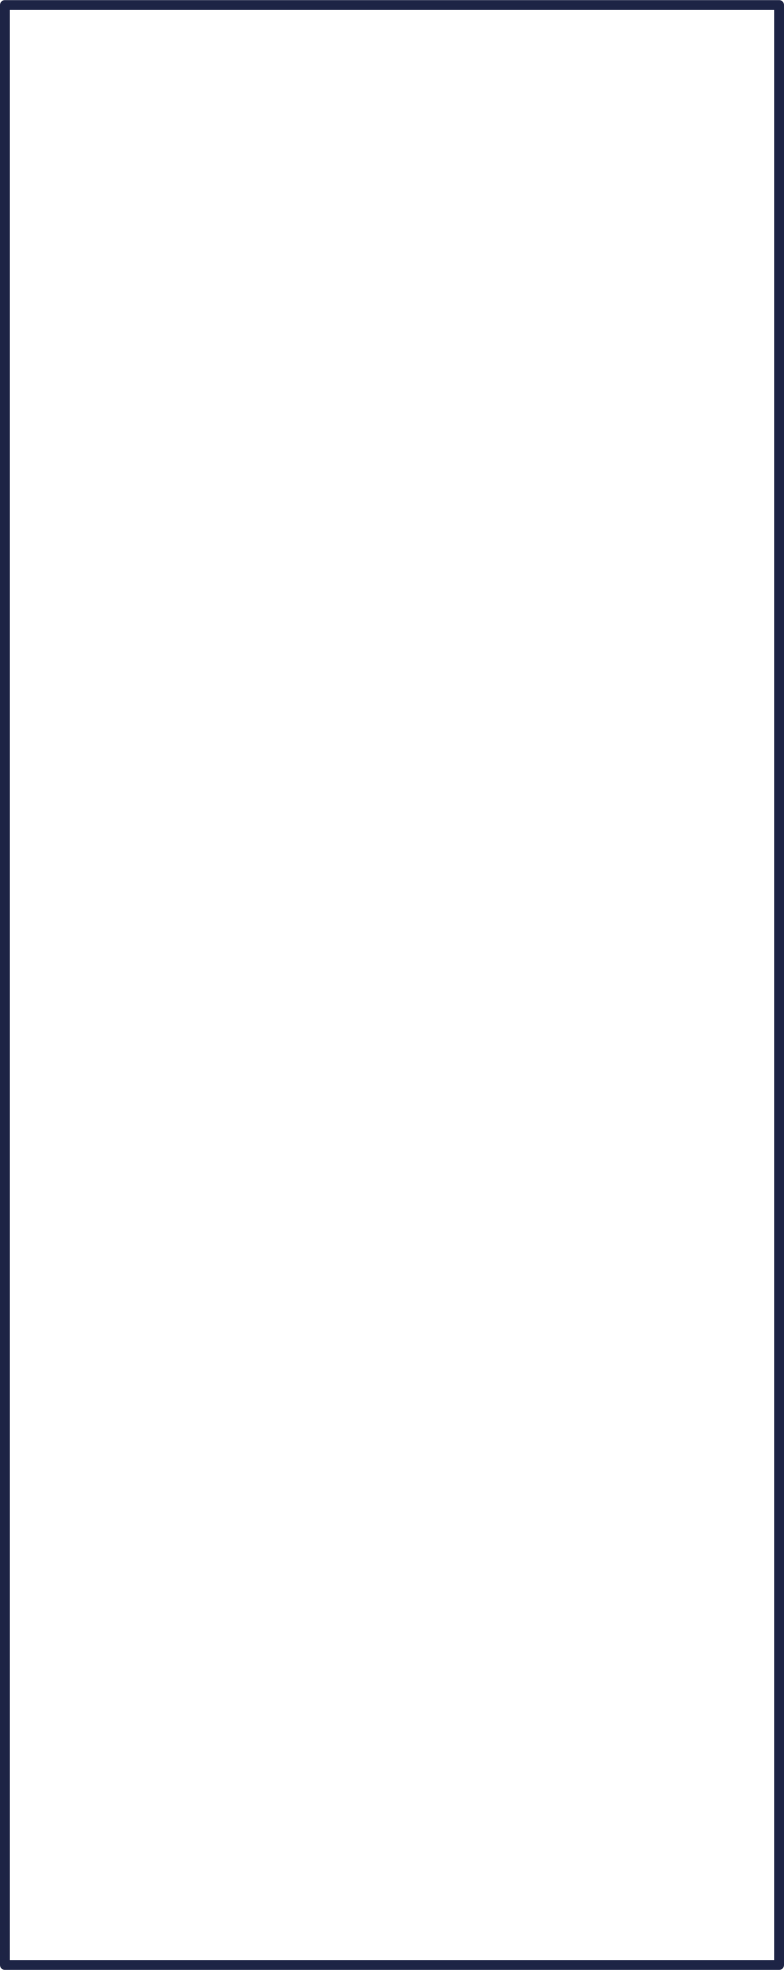 premium upgrade  building 3 line Clipart illustration in PNG, SVG